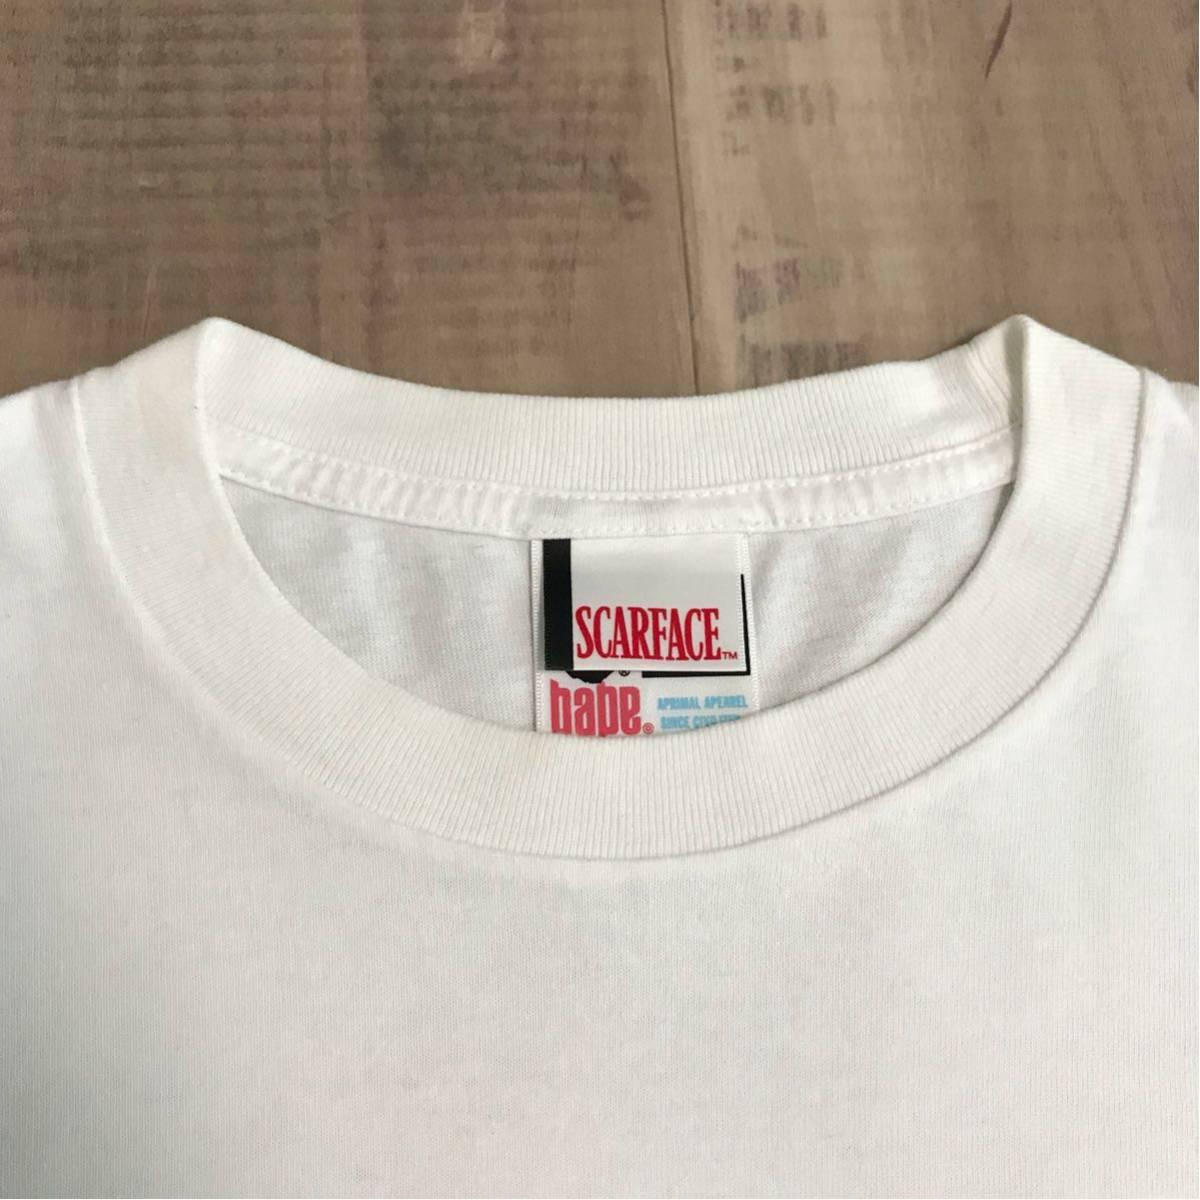 ★XL★ SCARFACE × BAPE Tシャツ a bathing ape スカーフェイス エイプ ベイプ Al Pacino scar face nigo アルパチーノ